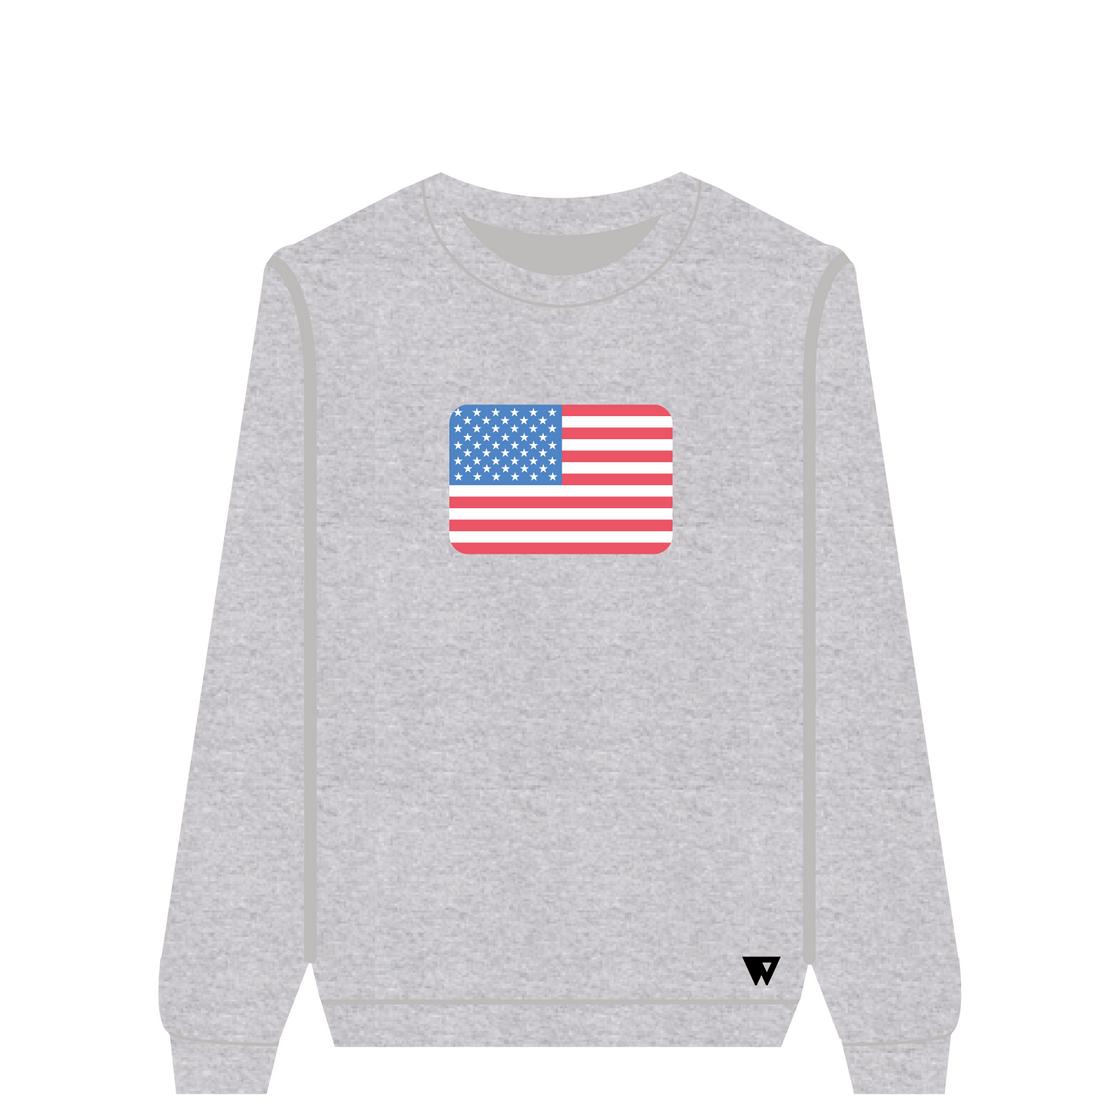 Sweatshirt Usa | Wuzzee